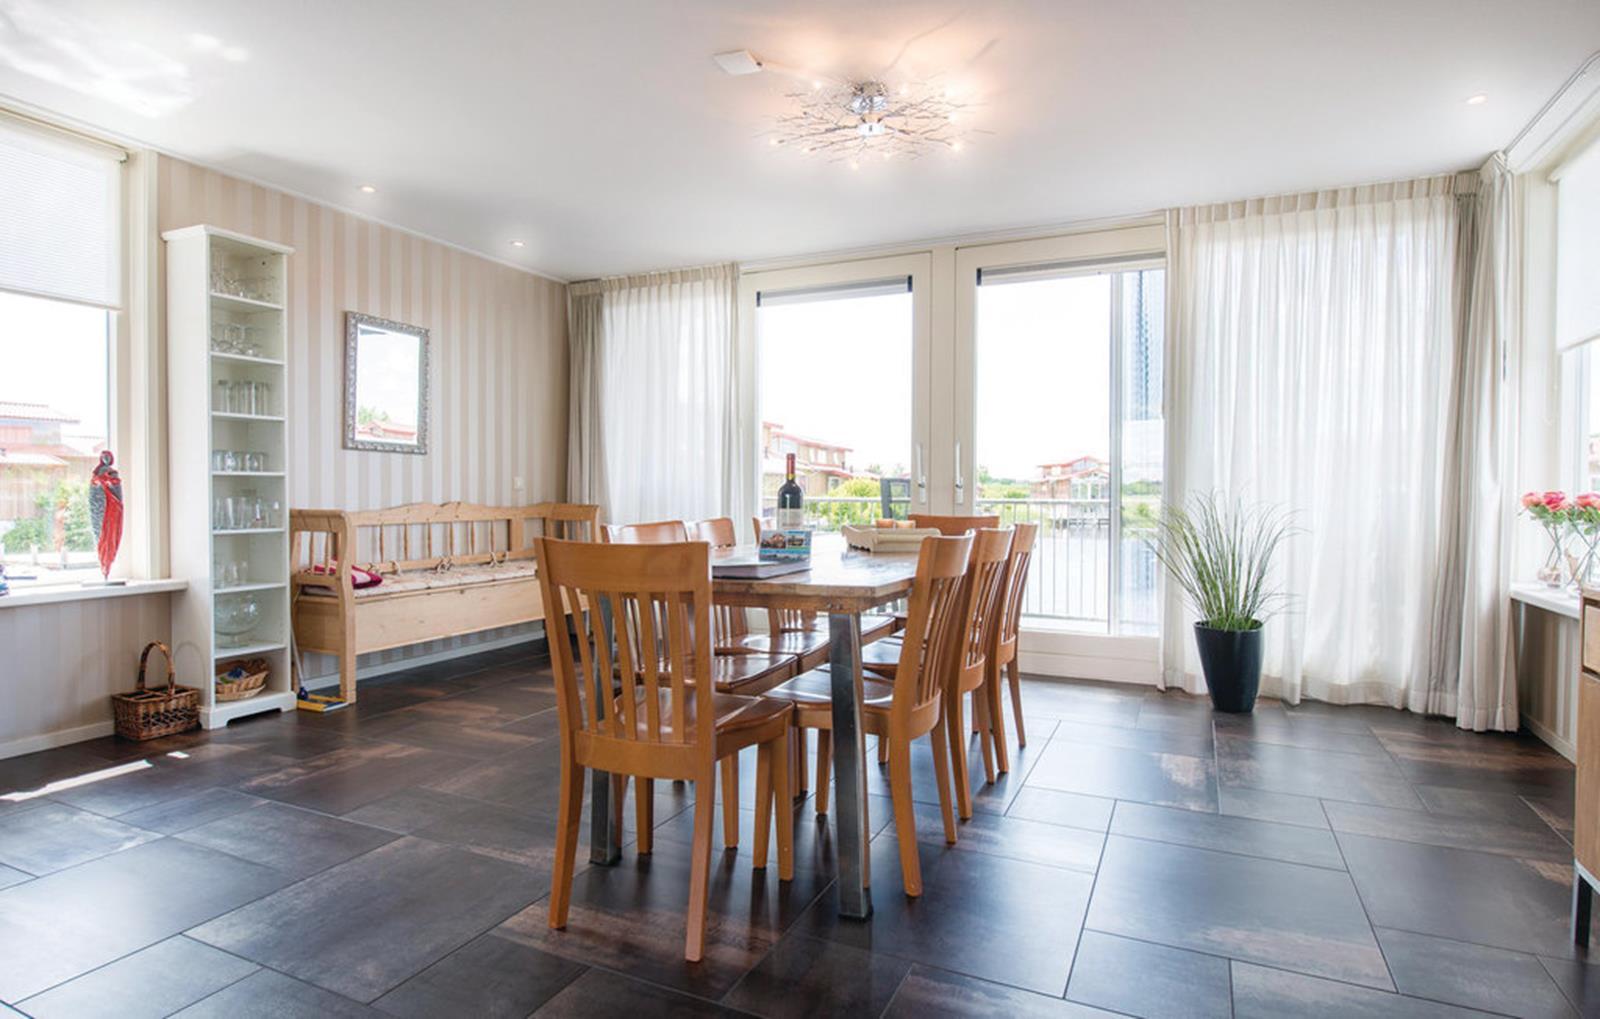 Vakantiehuis te koop Friesland Noardburgum 019.jpg